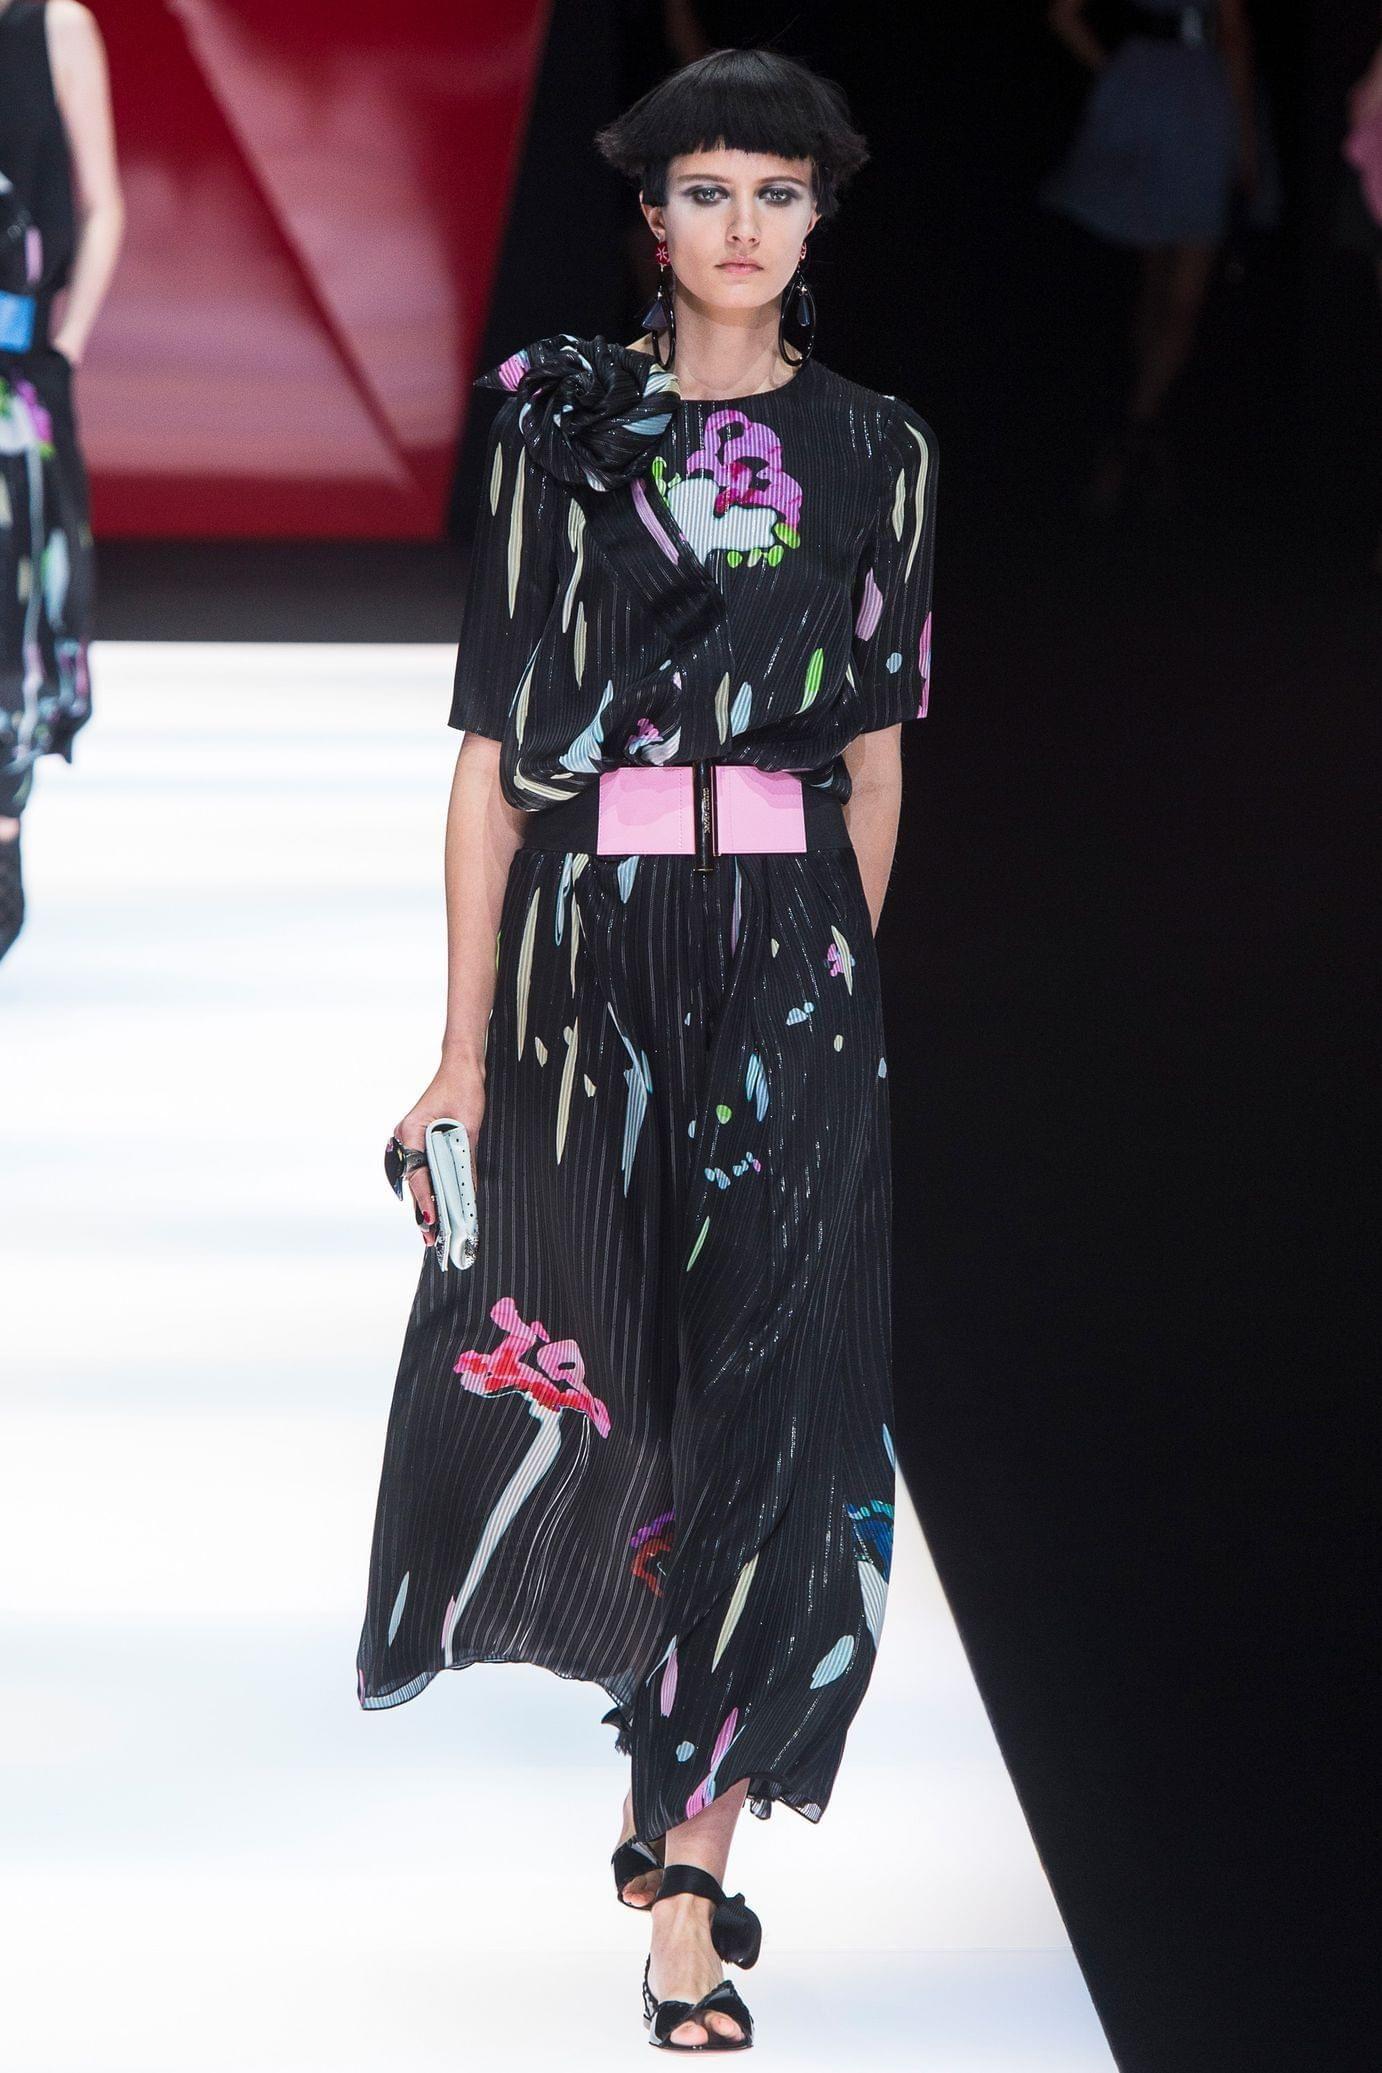 Giorgio Armani весна лето 2018 длинное платье